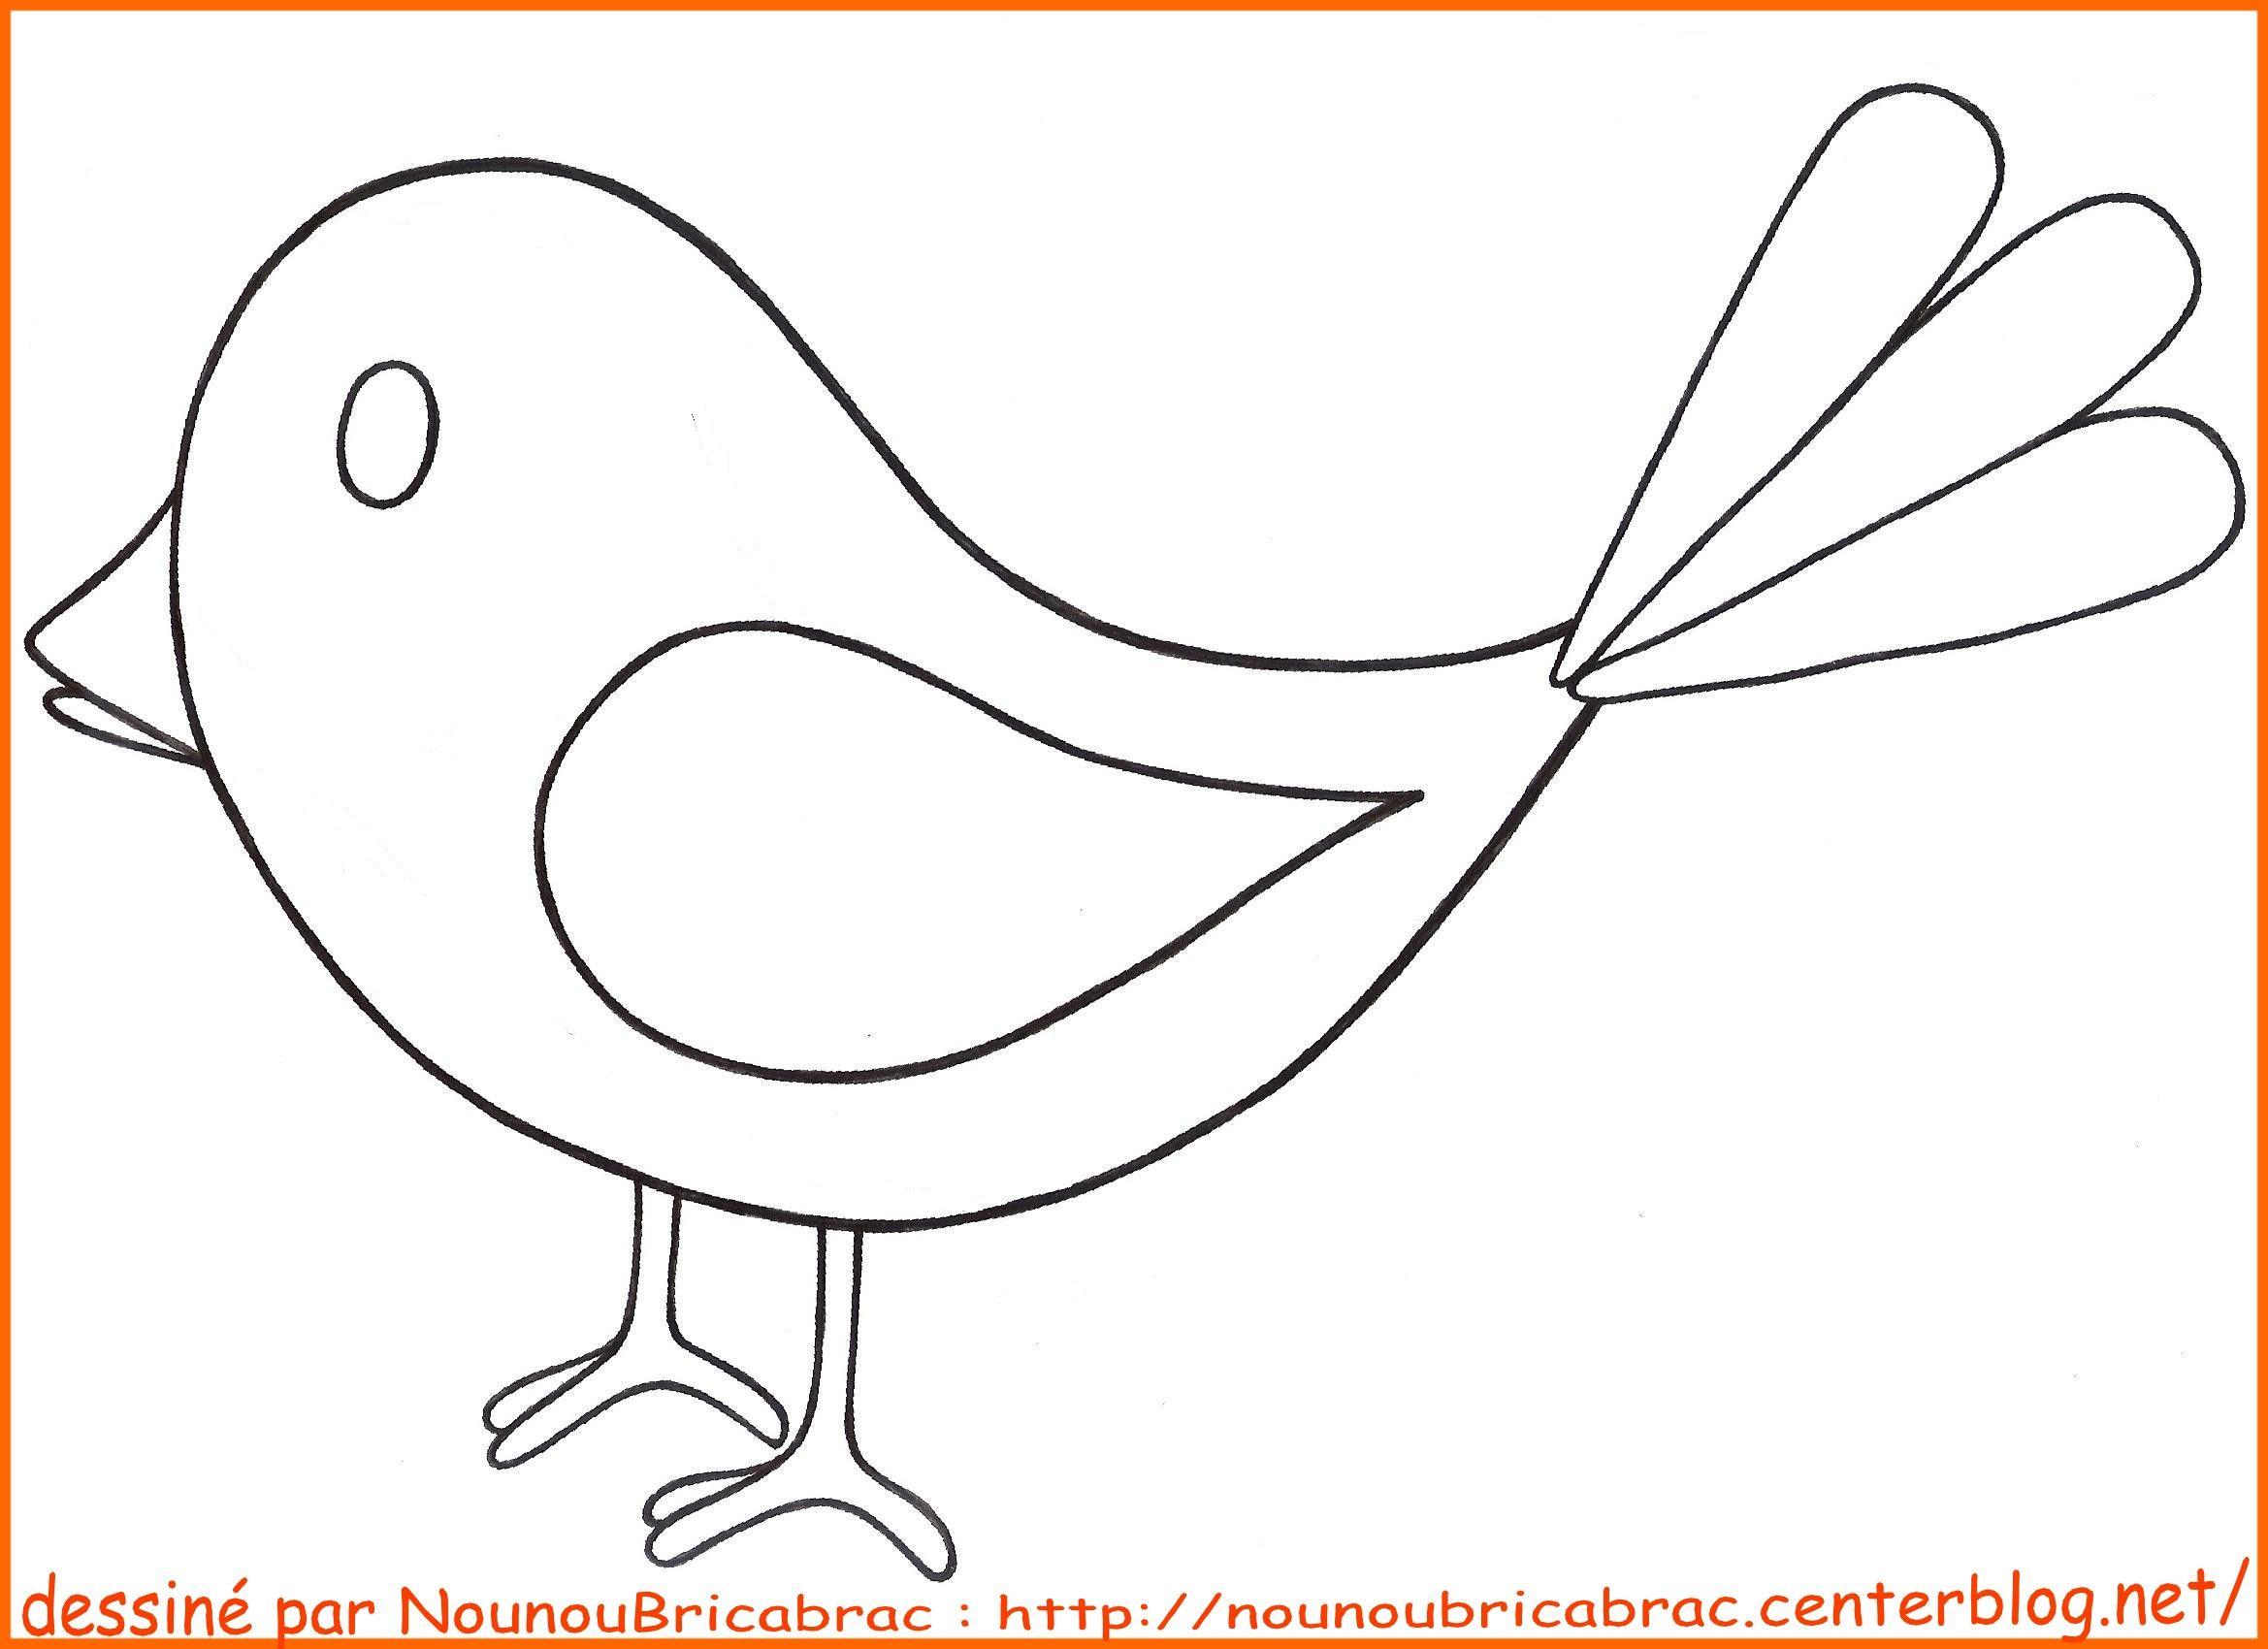 Dessin Facile Oiseau Picture | Oiseau Coloriage, Coloriage encequiconcerne Dessin D Oiseau Simple